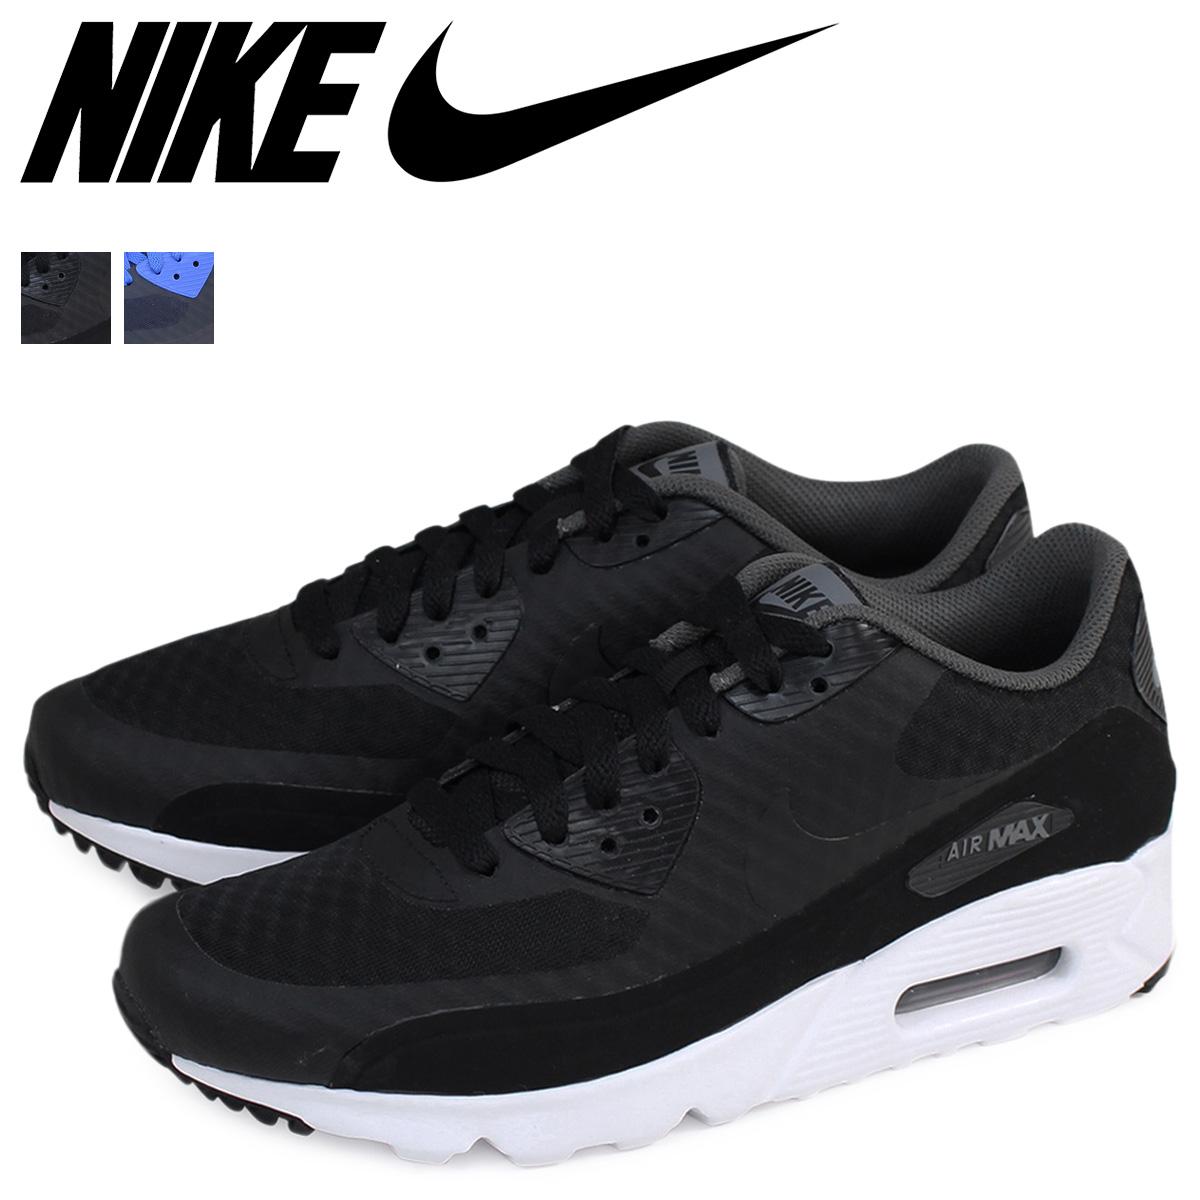 Mens Nike Air Max 90 Ultra Essential Running Shoes Dark Grey White Black 819474 013 819474 013